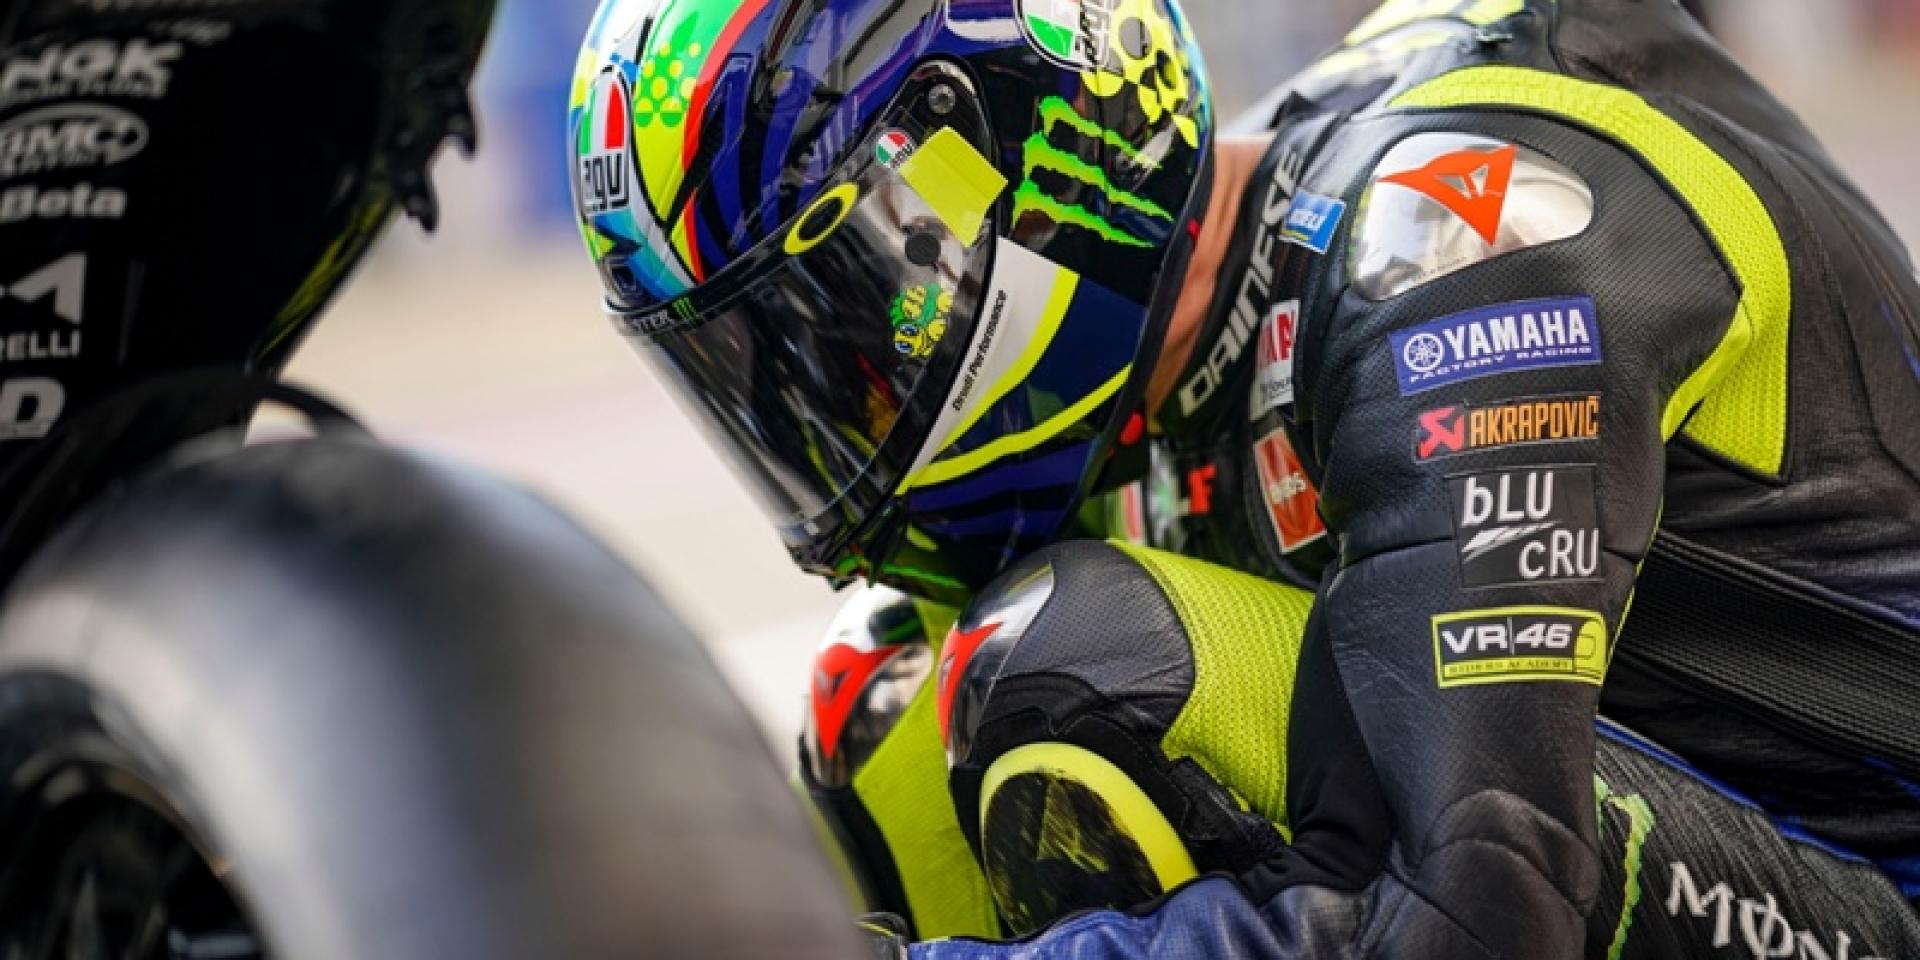 大哥沒有輸?YAMAHA:Valentino Rossi的轉隊並不會影響YAMAHA開發賽車的方式。